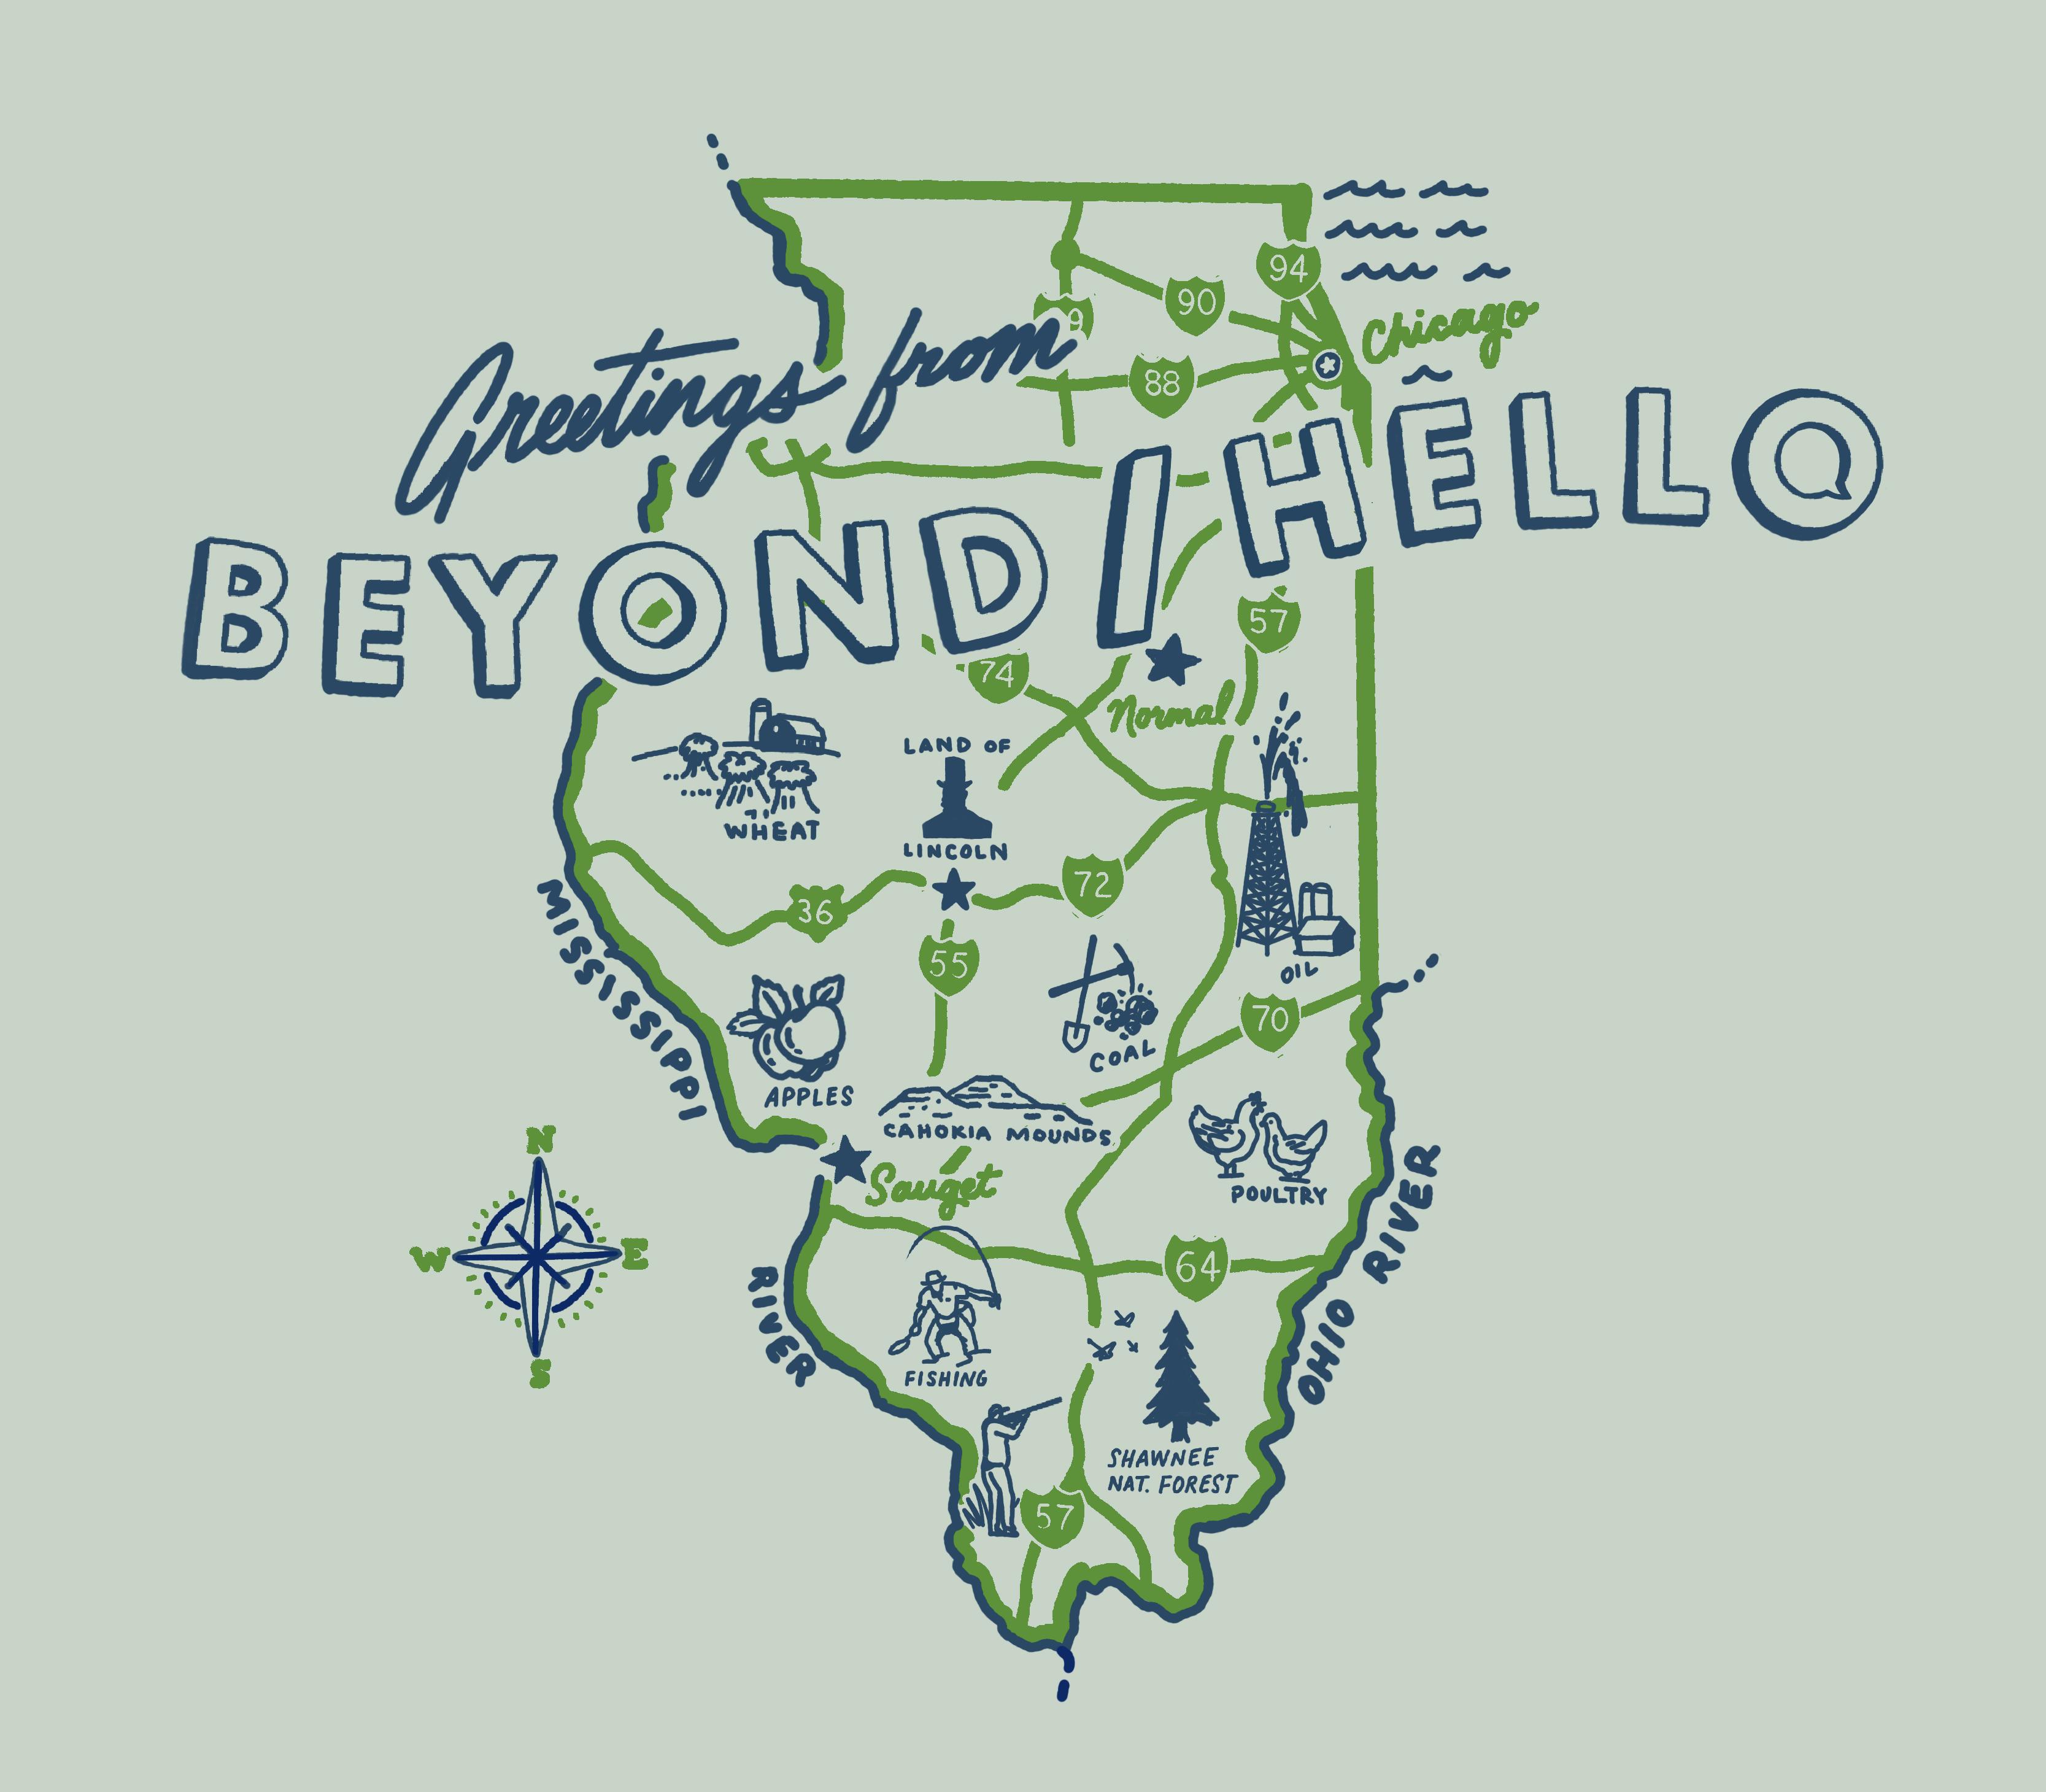 Beyond/Hello